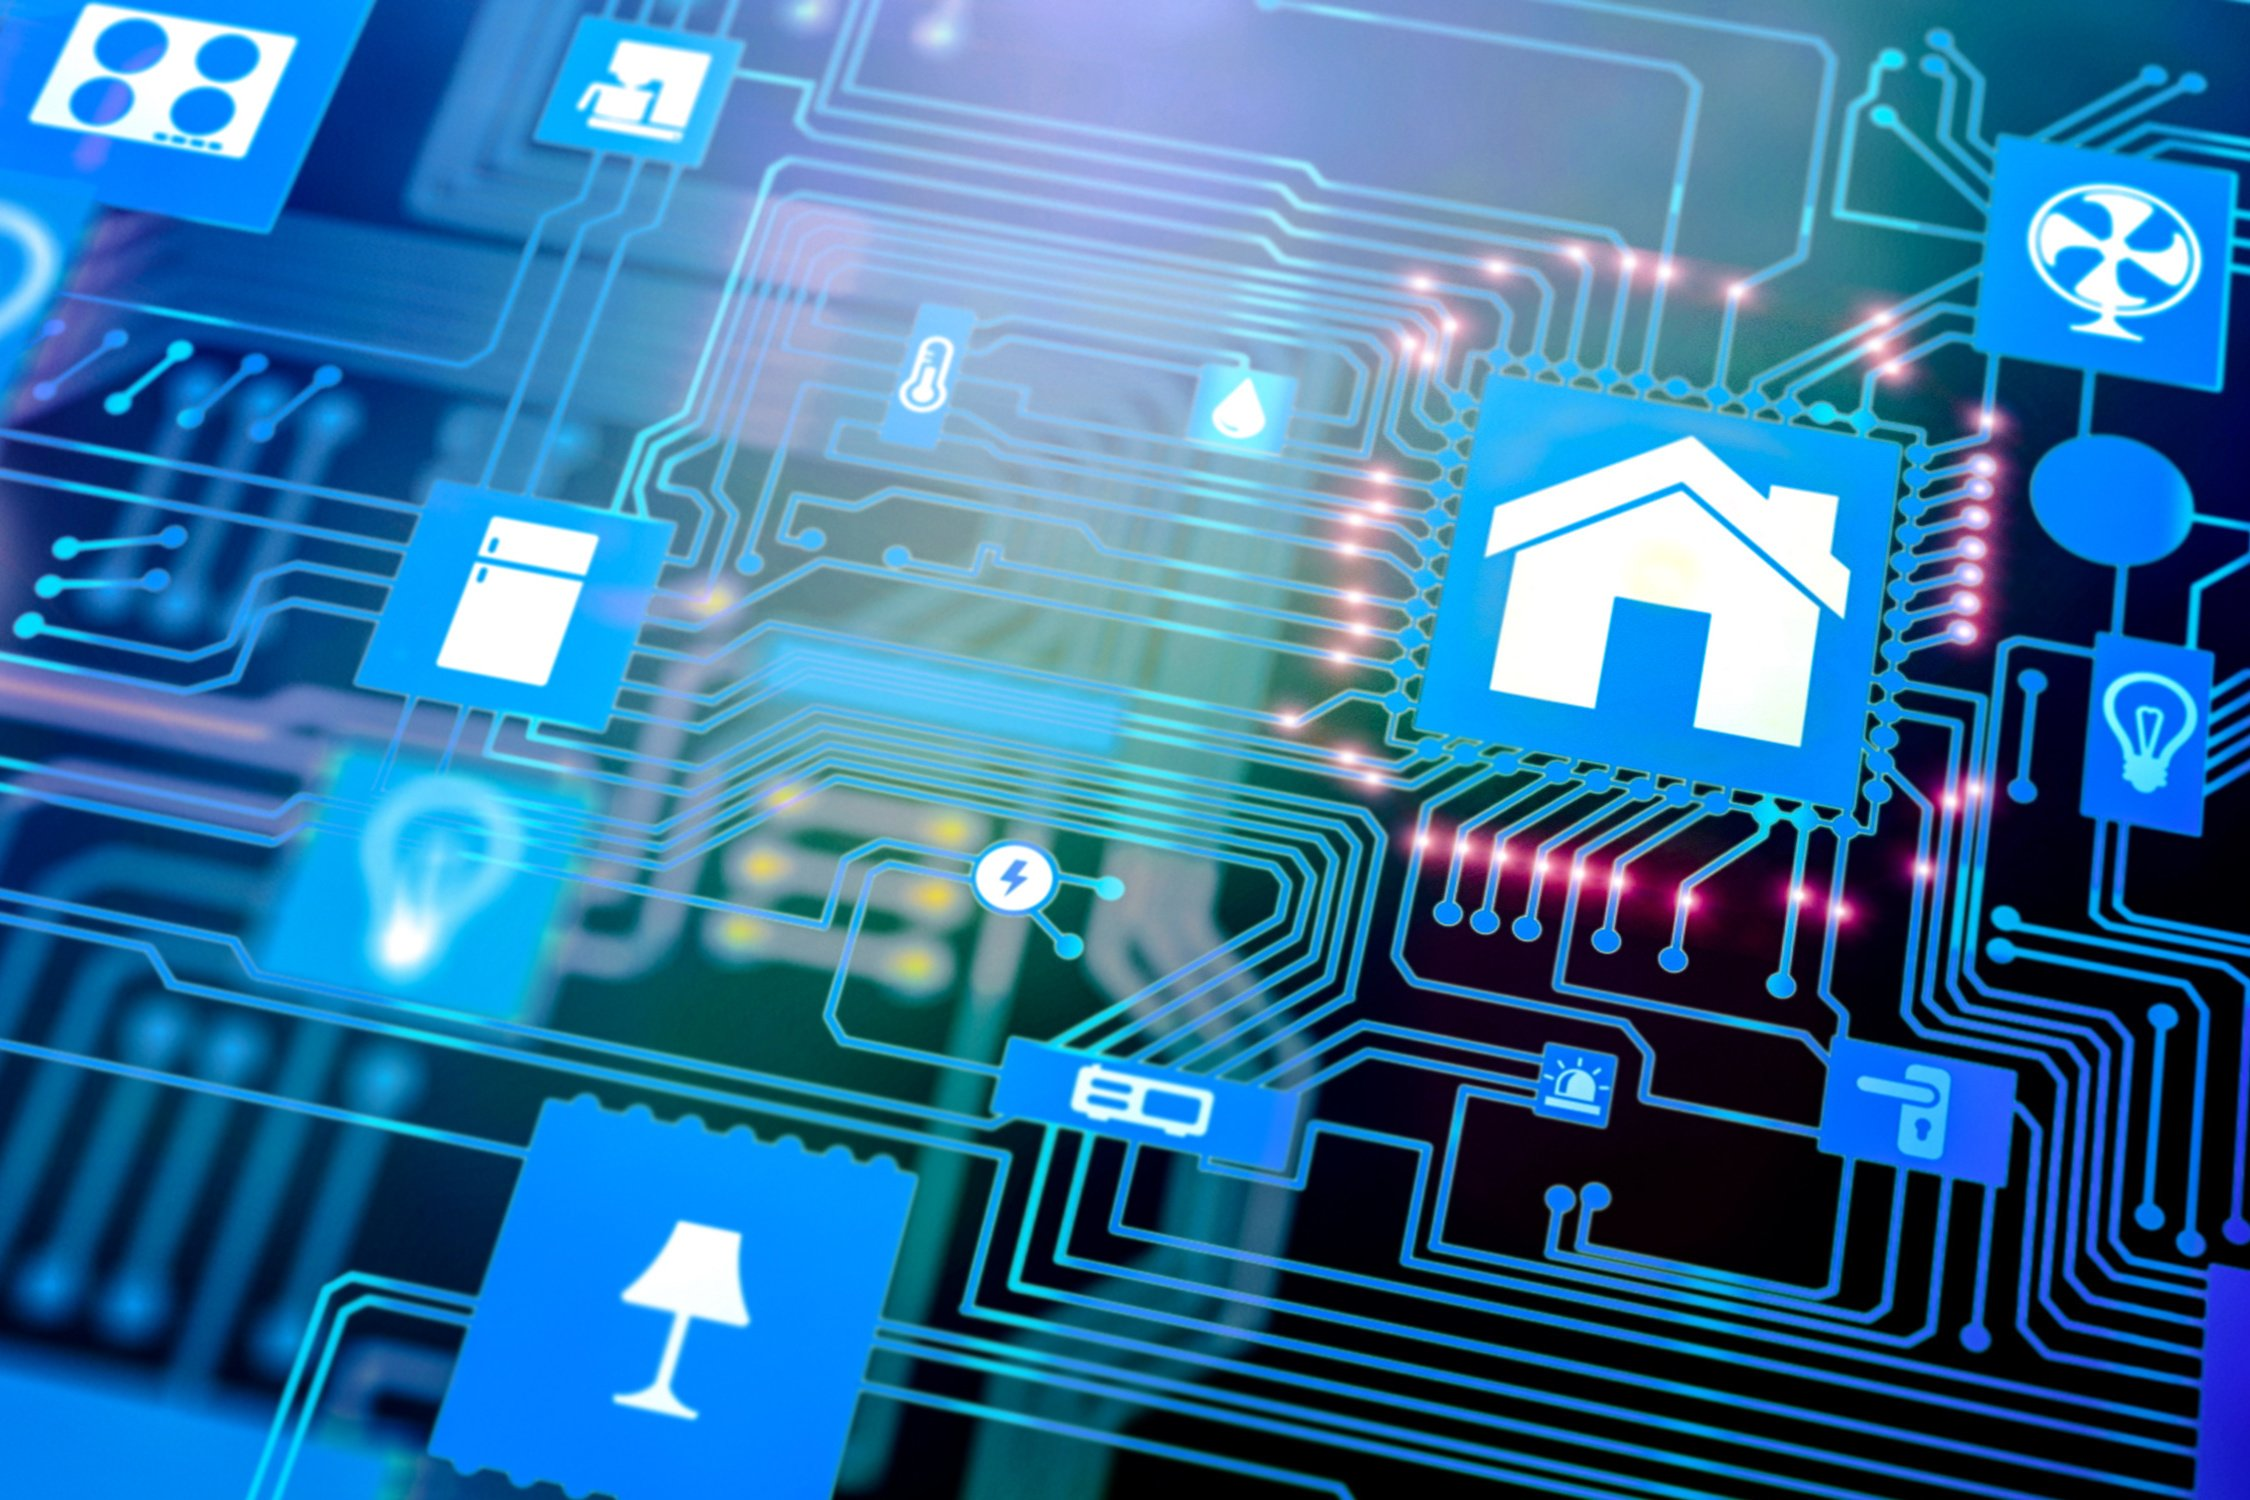 Цифровое ЖКХ и автоматизация зданий